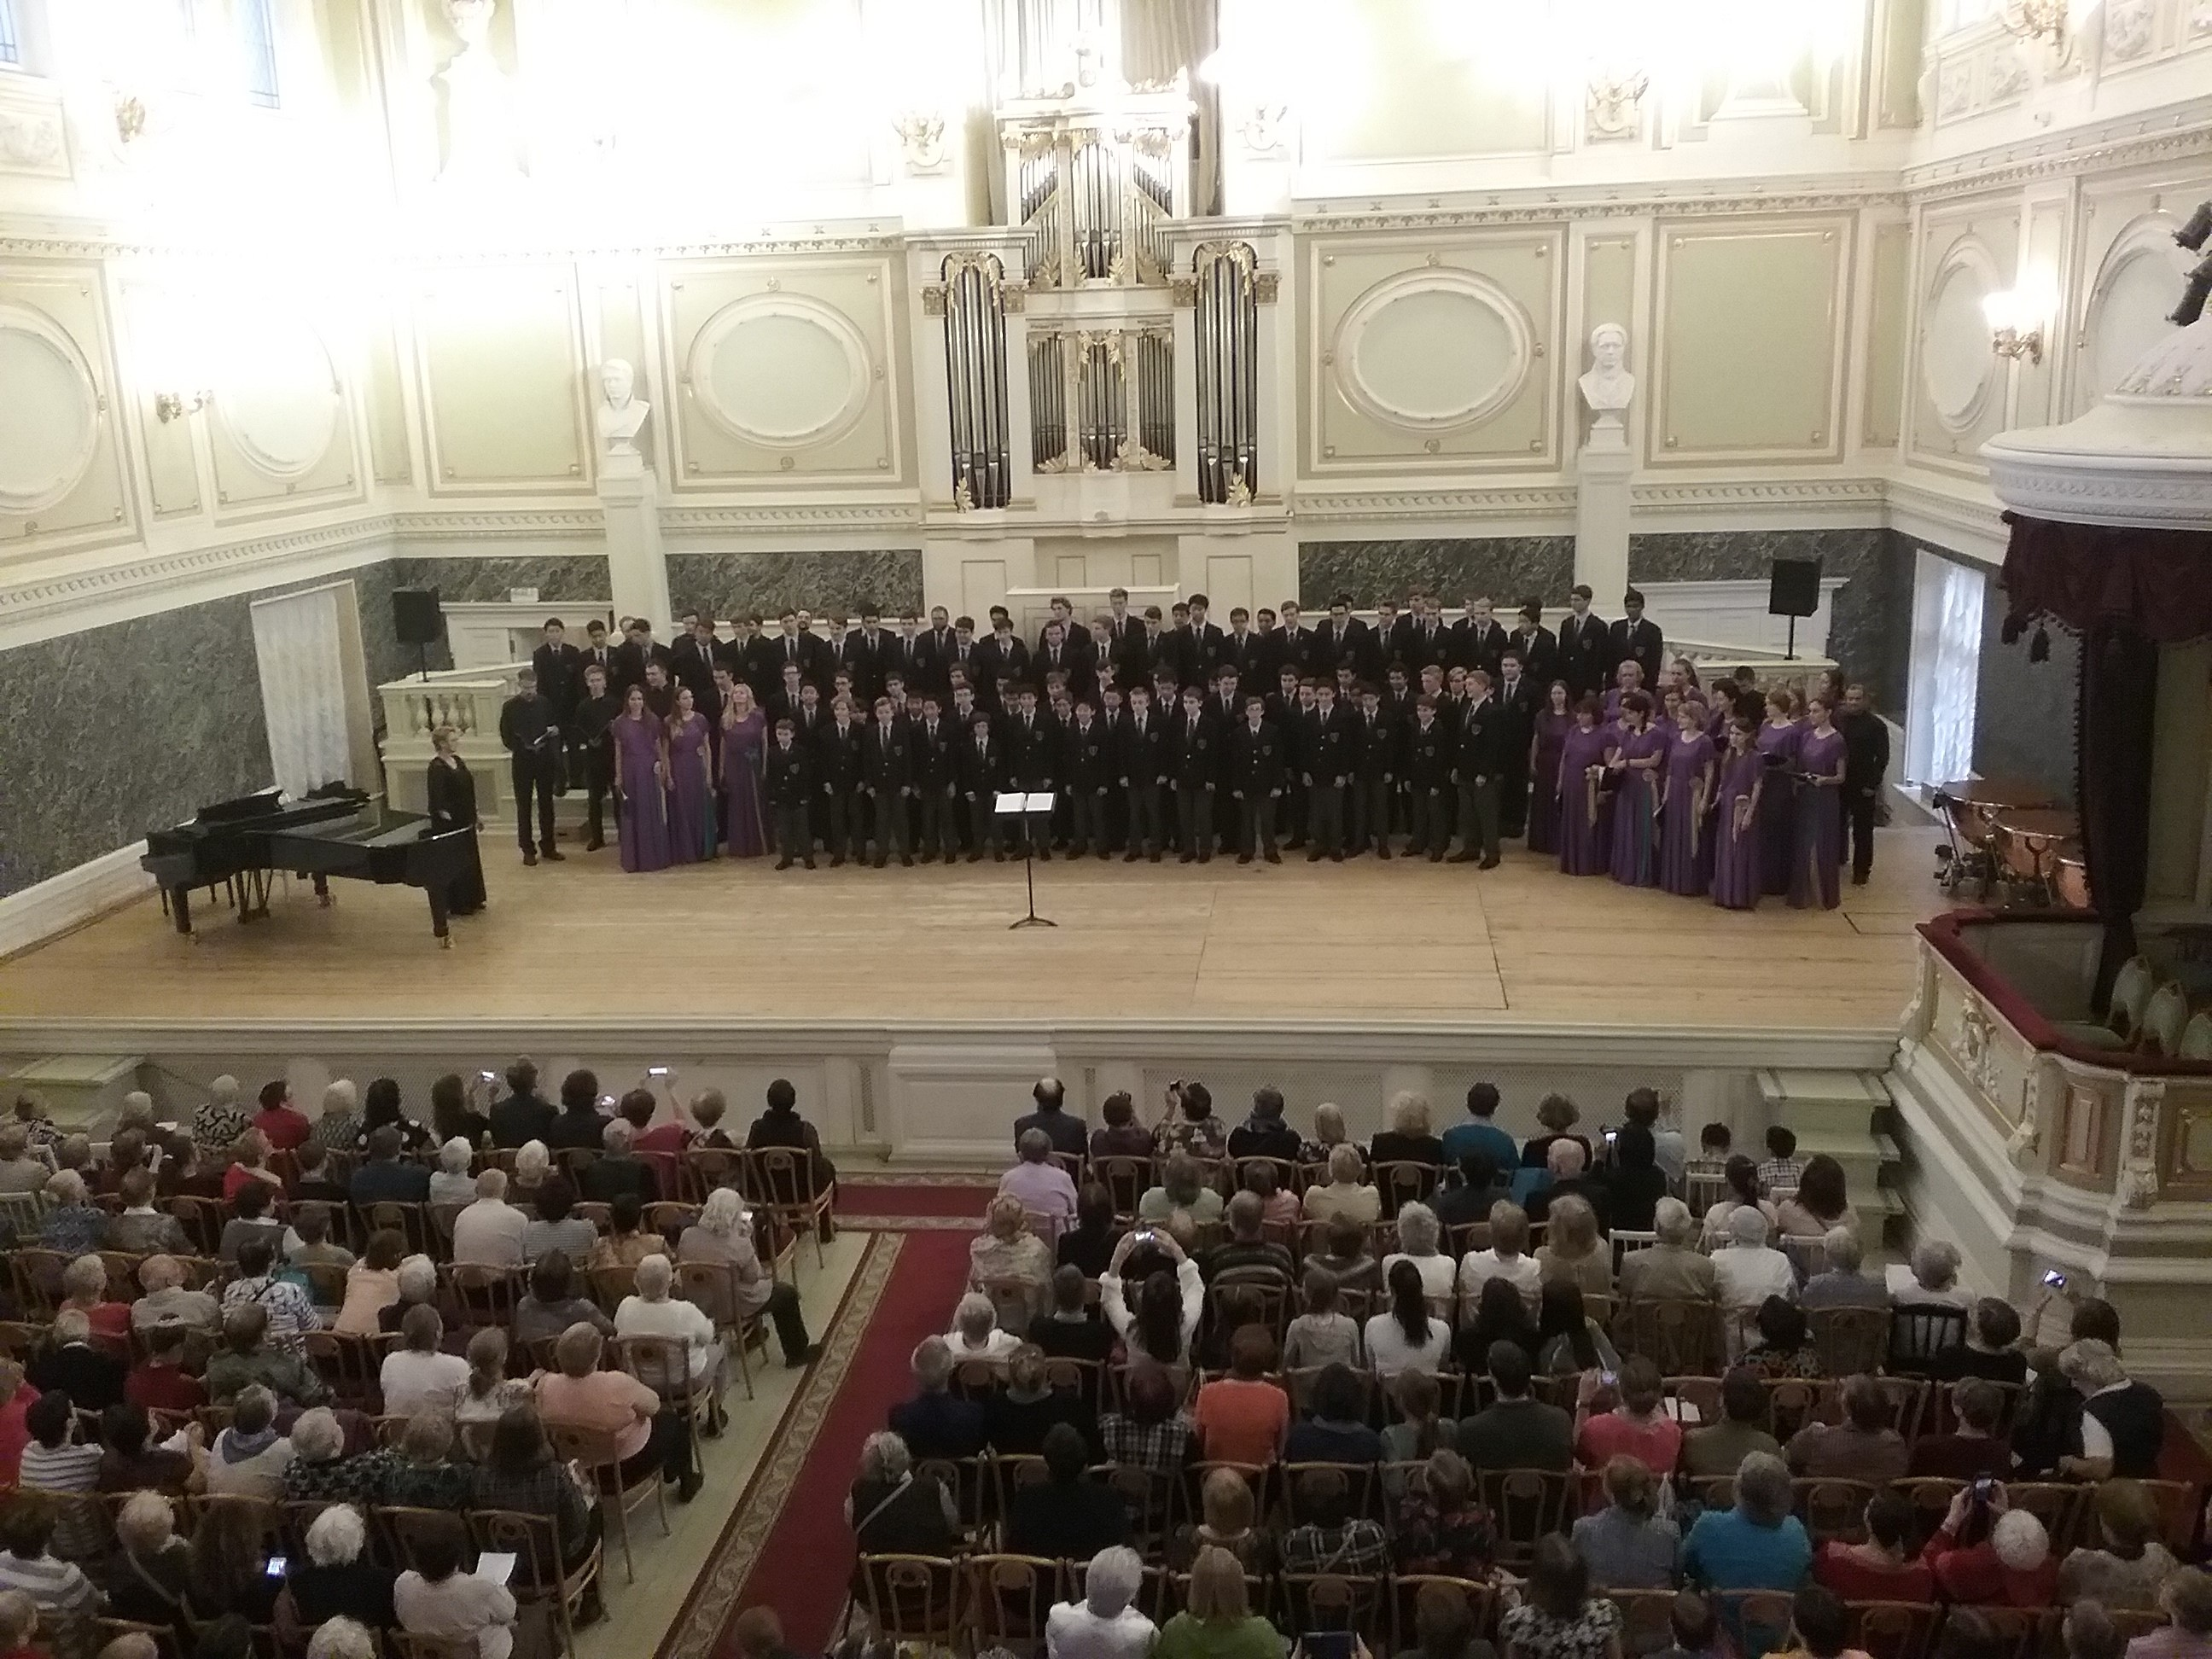 Ragazzi Boys Chorus concert in Capella